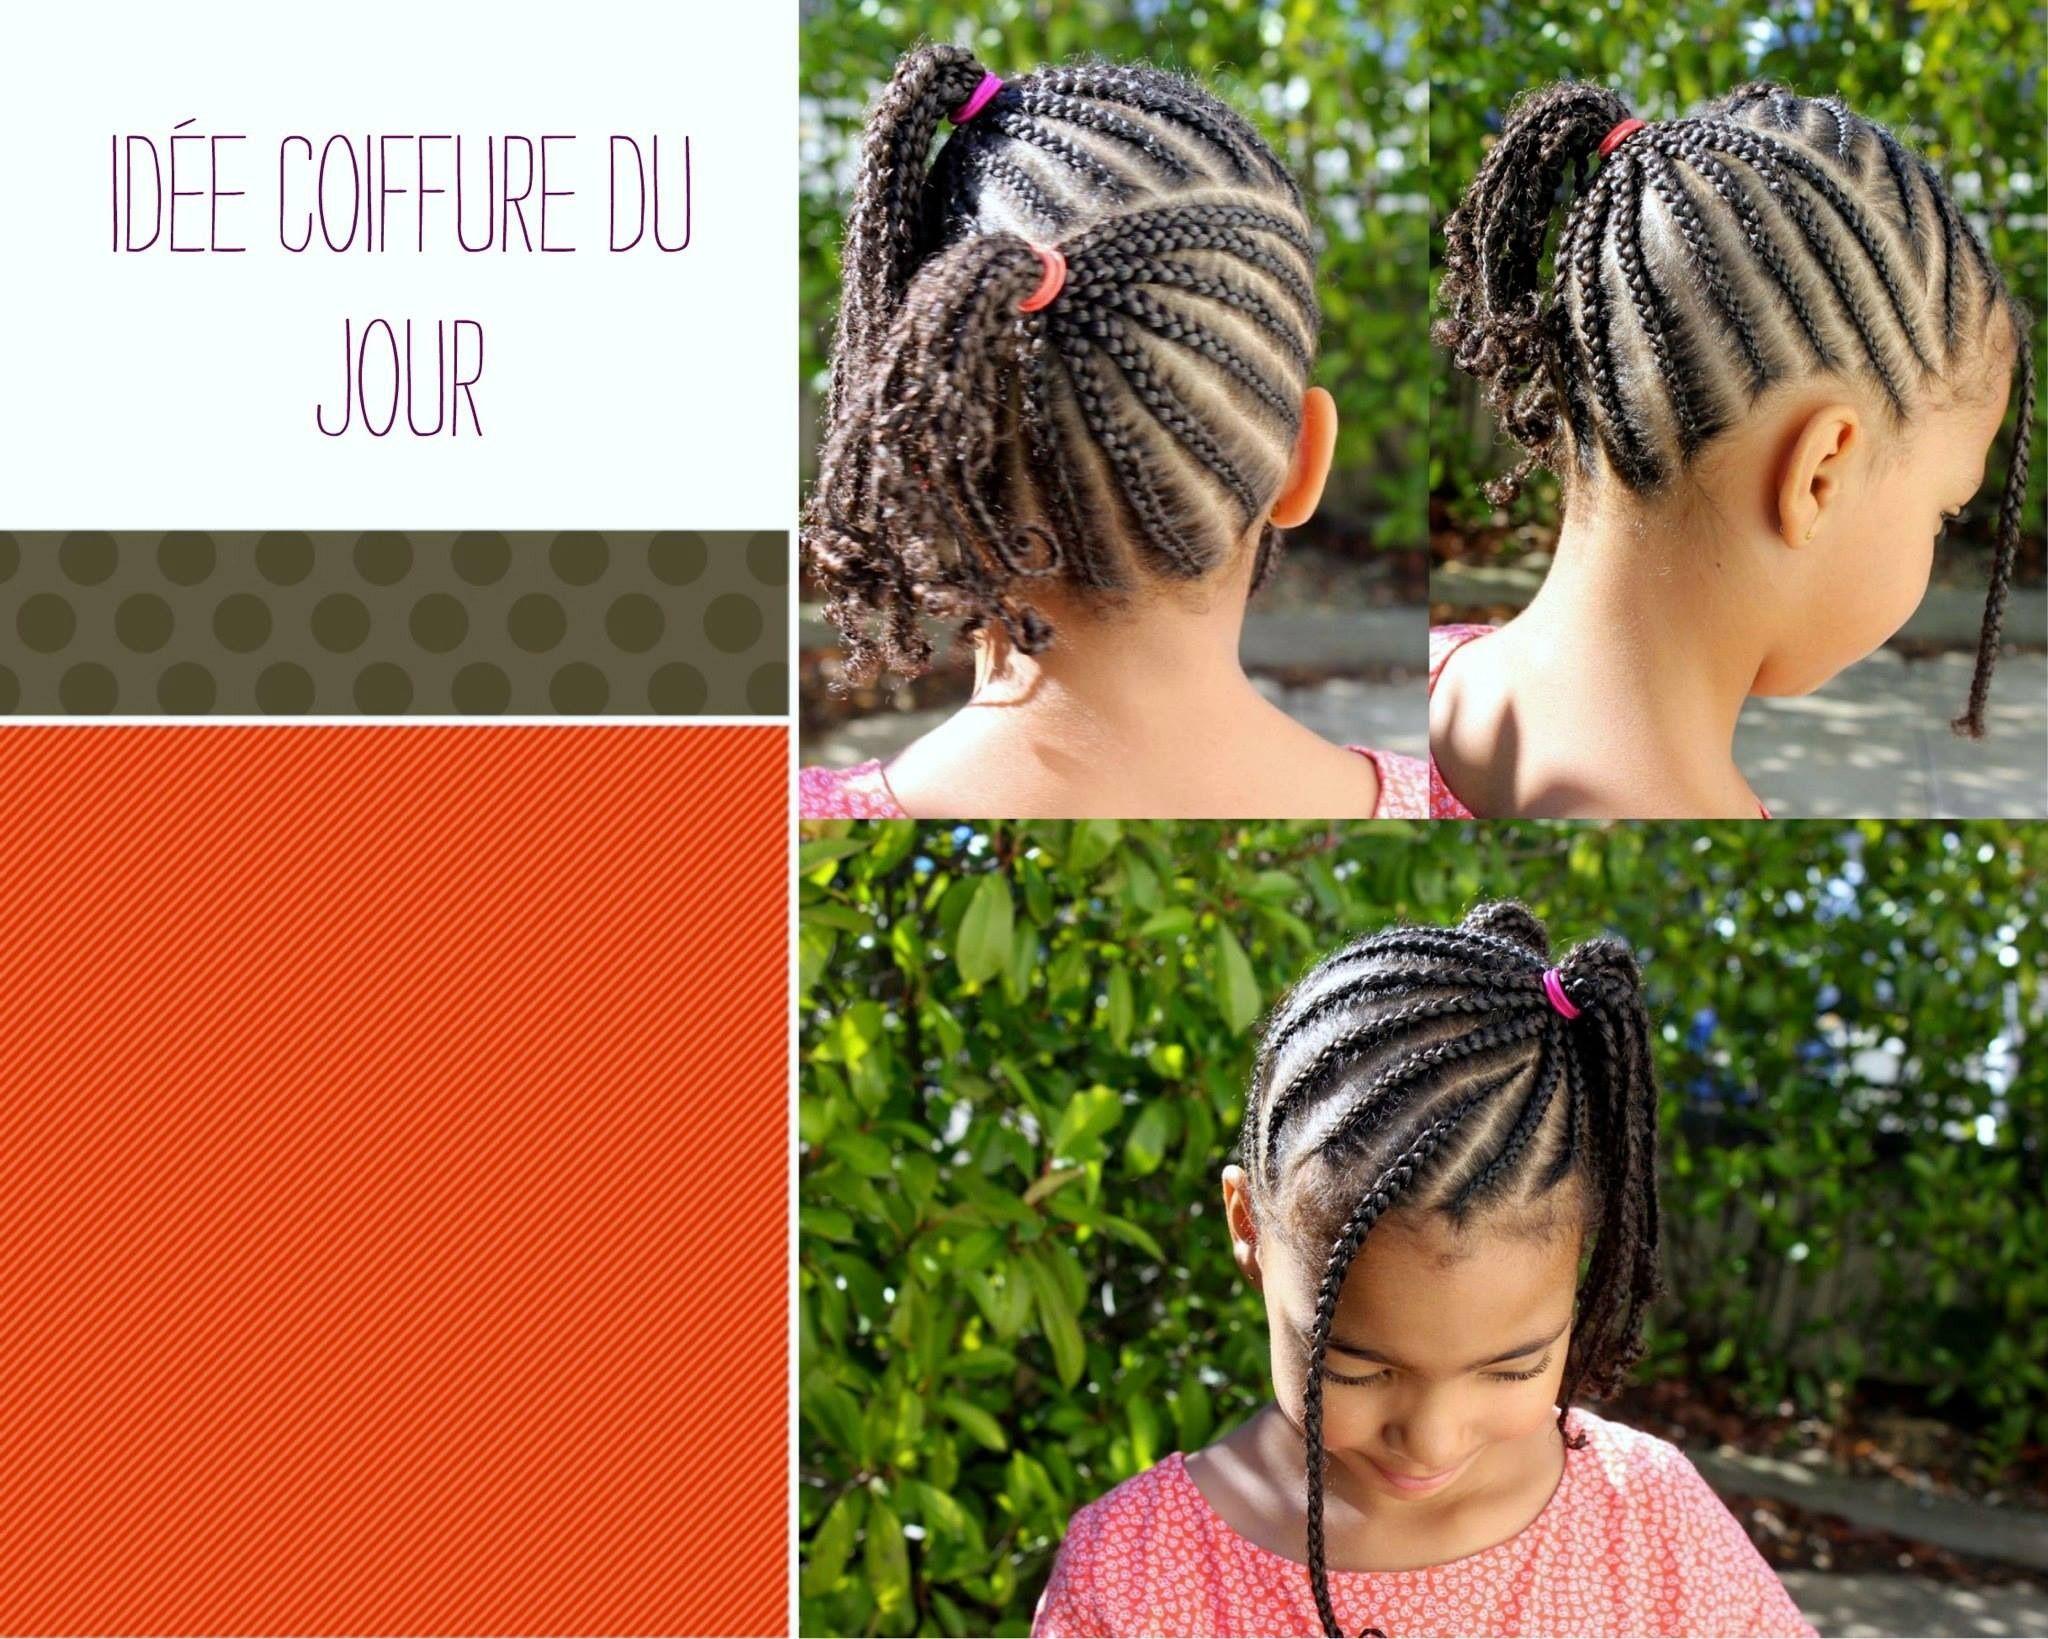 cr dits photos nos tifs d frises coiffure pinterest idee coiffure petites filles noires. Black Bedroom Furniture Sets. Home Design Ideas